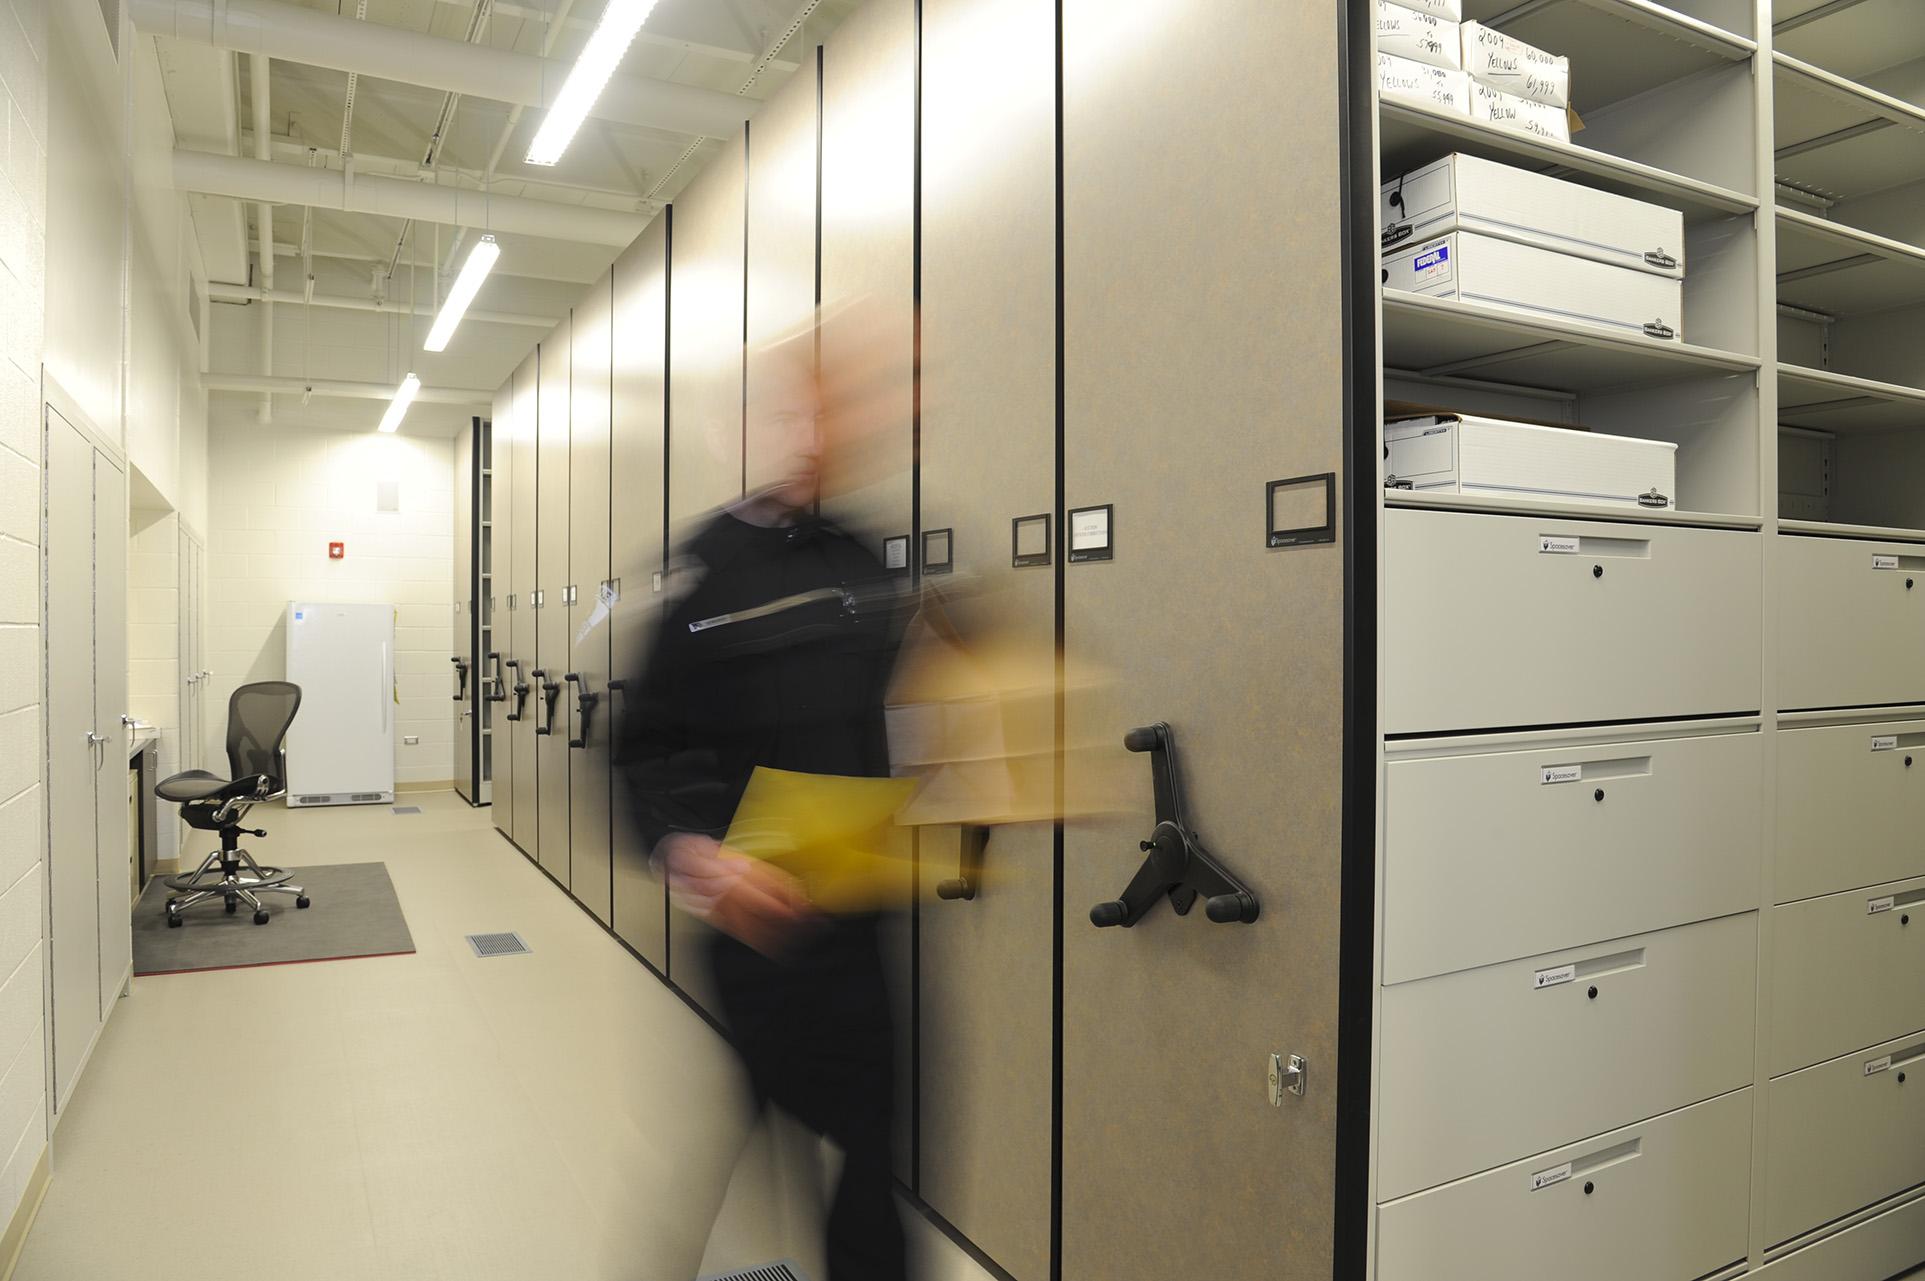 Mobile Storage for Evidence at Skokie Police Department